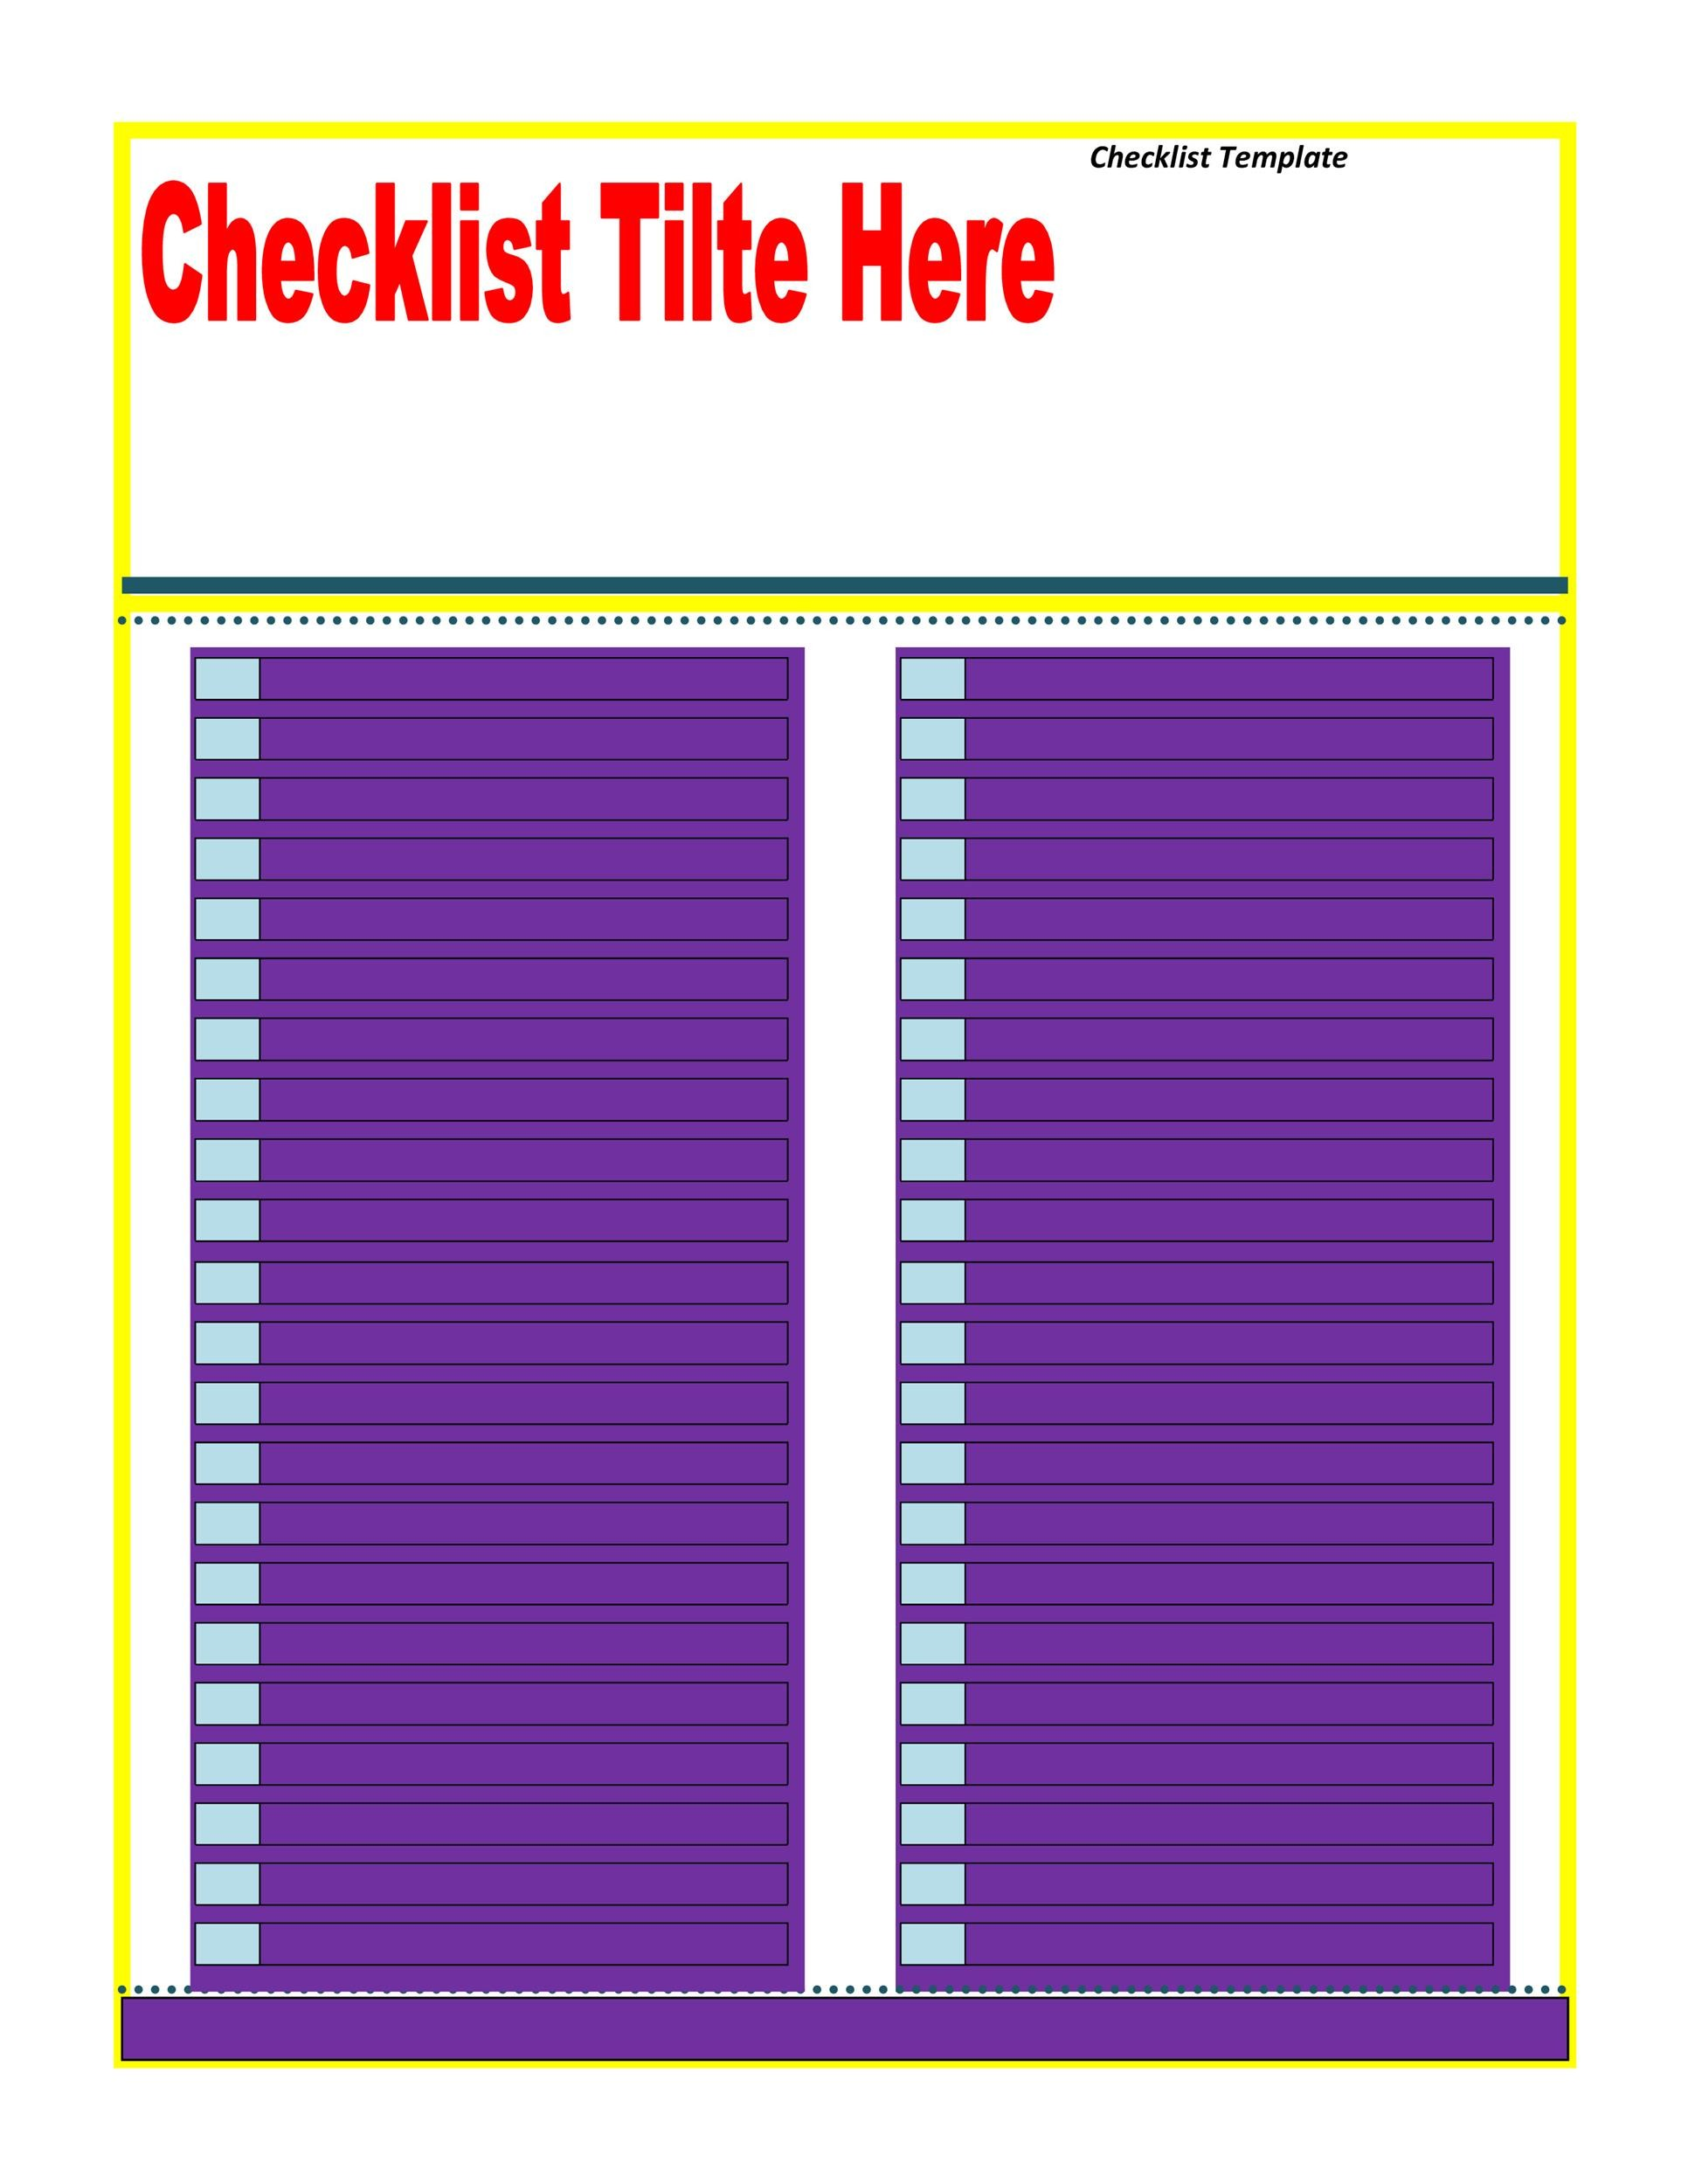 Free Checklist Template 06